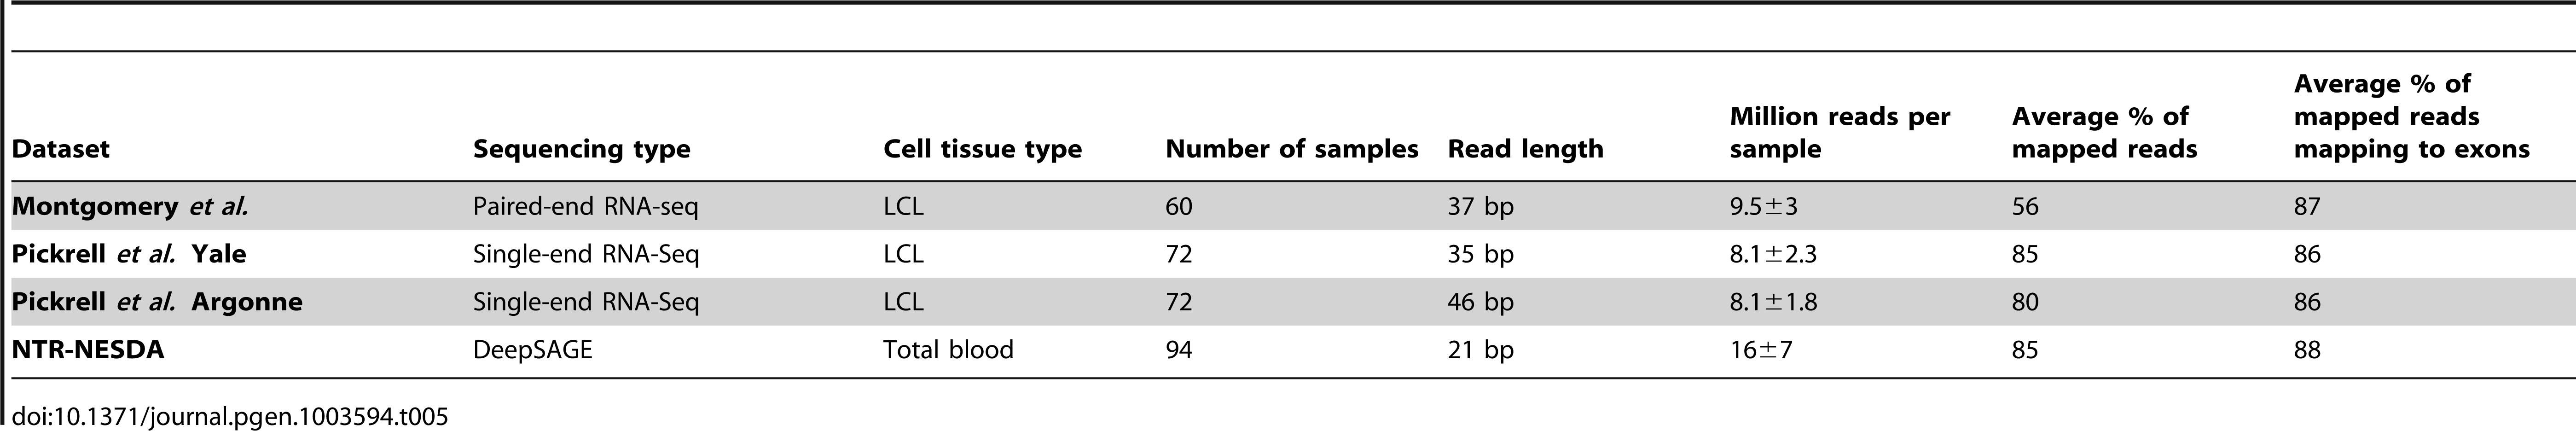 Description of RNA next generation sequencing datasets.